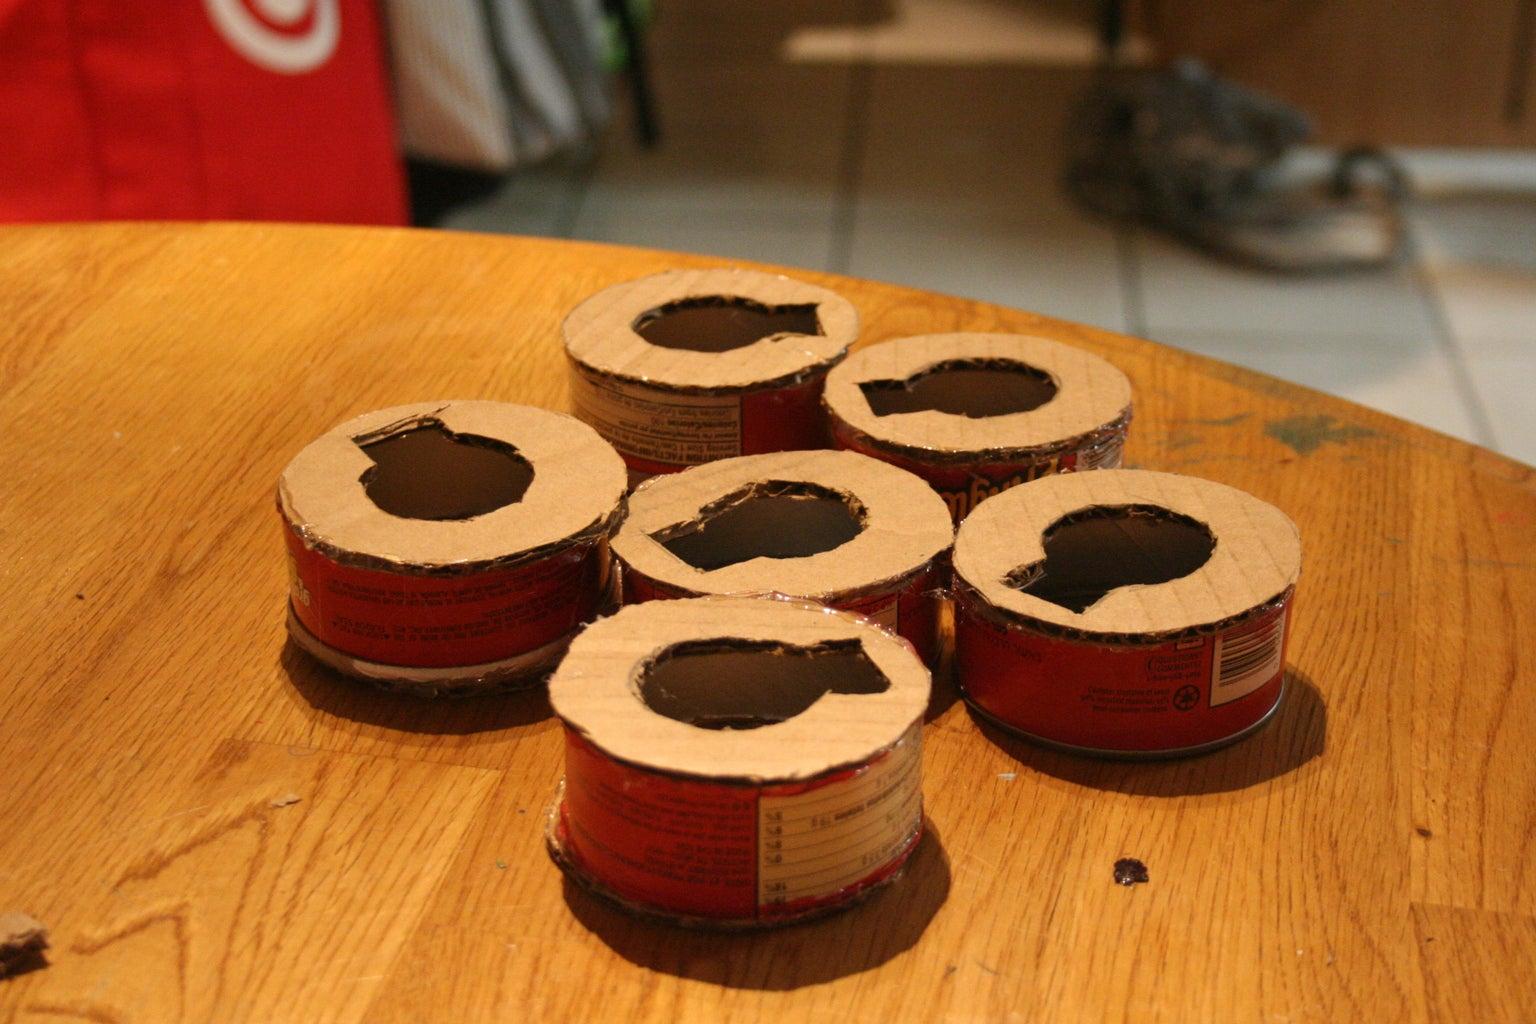 Glue the Rings to Make Tumblers